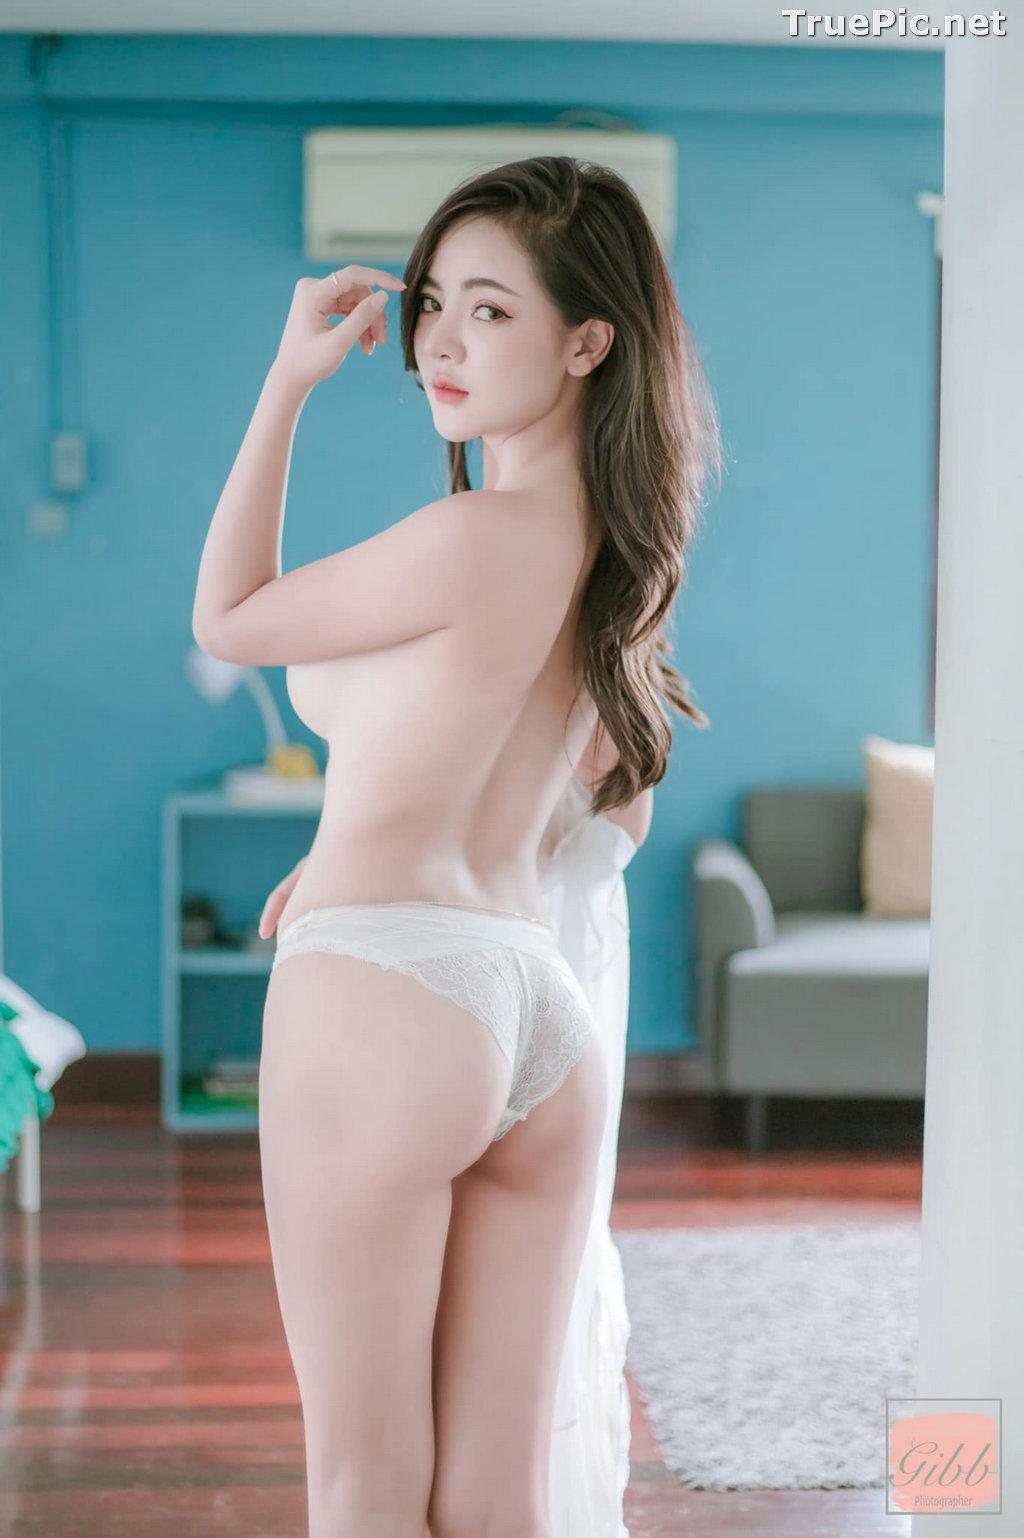 Image Thailand Sexy Model - Montakan Kaengraeng - Hot Meow Meow Kitten - TruePic.net - Picture-2